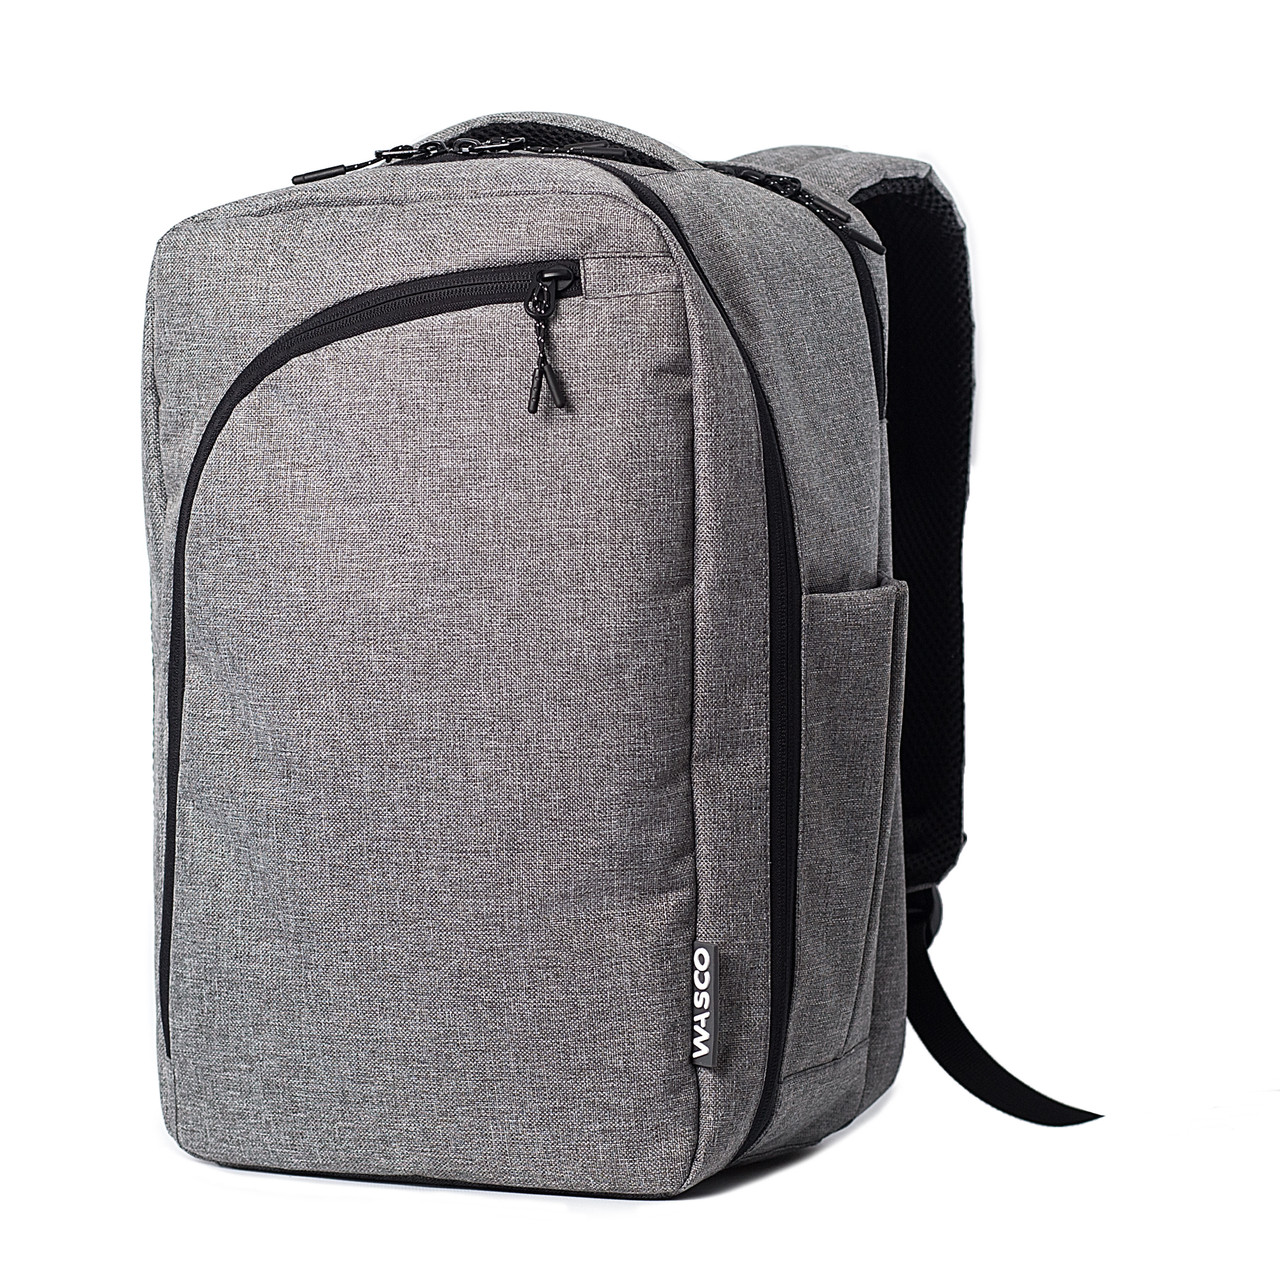 Рюкзак для ручной клади Wasco 40x25x20 Gen Fly Grey (Wizz Air / Ryanair)